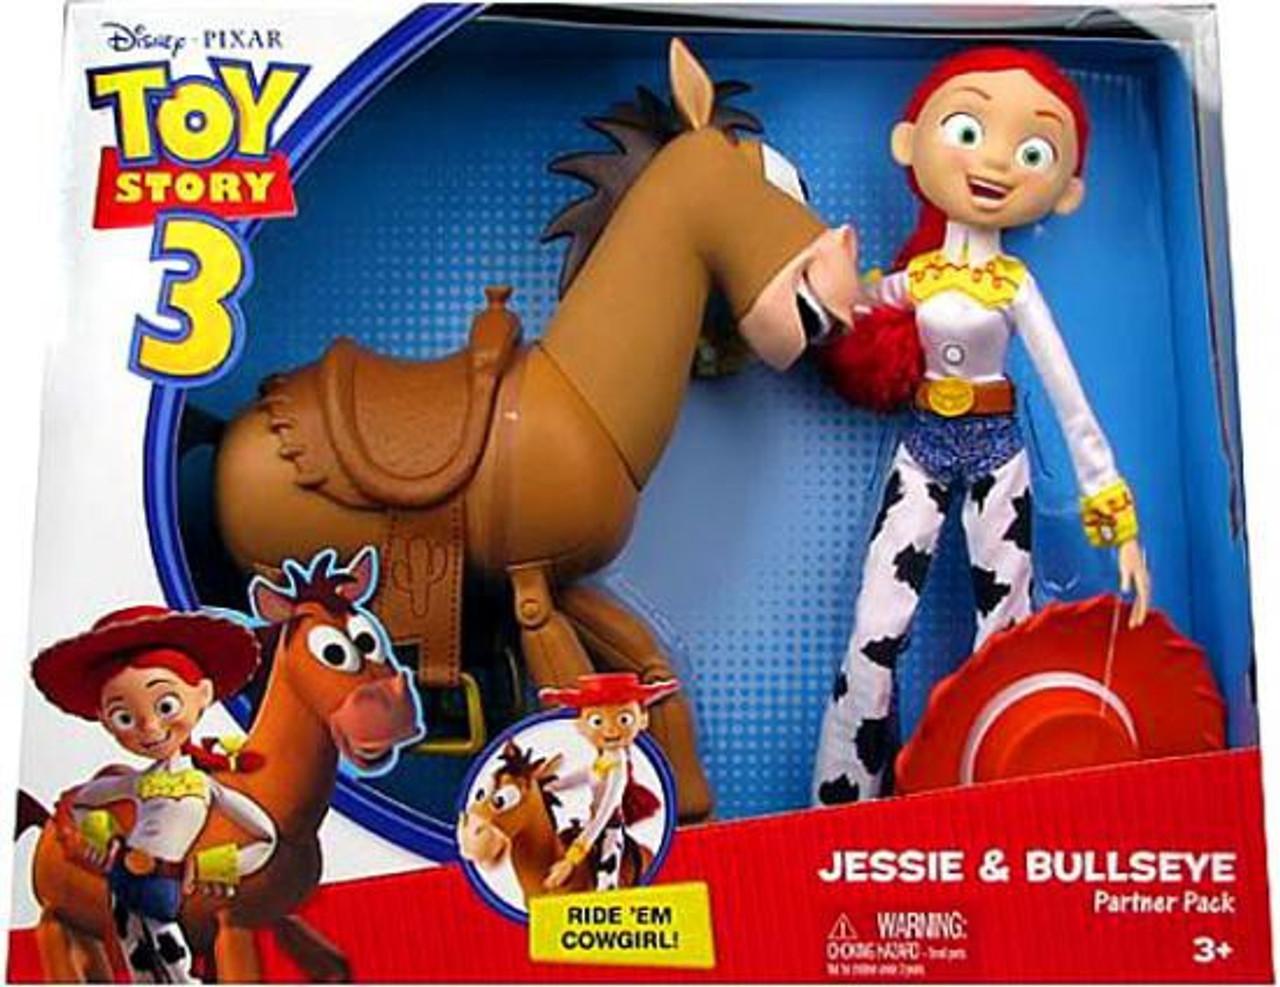 Toy Story 3 Jessie & Bullseye Doll 2-Pack